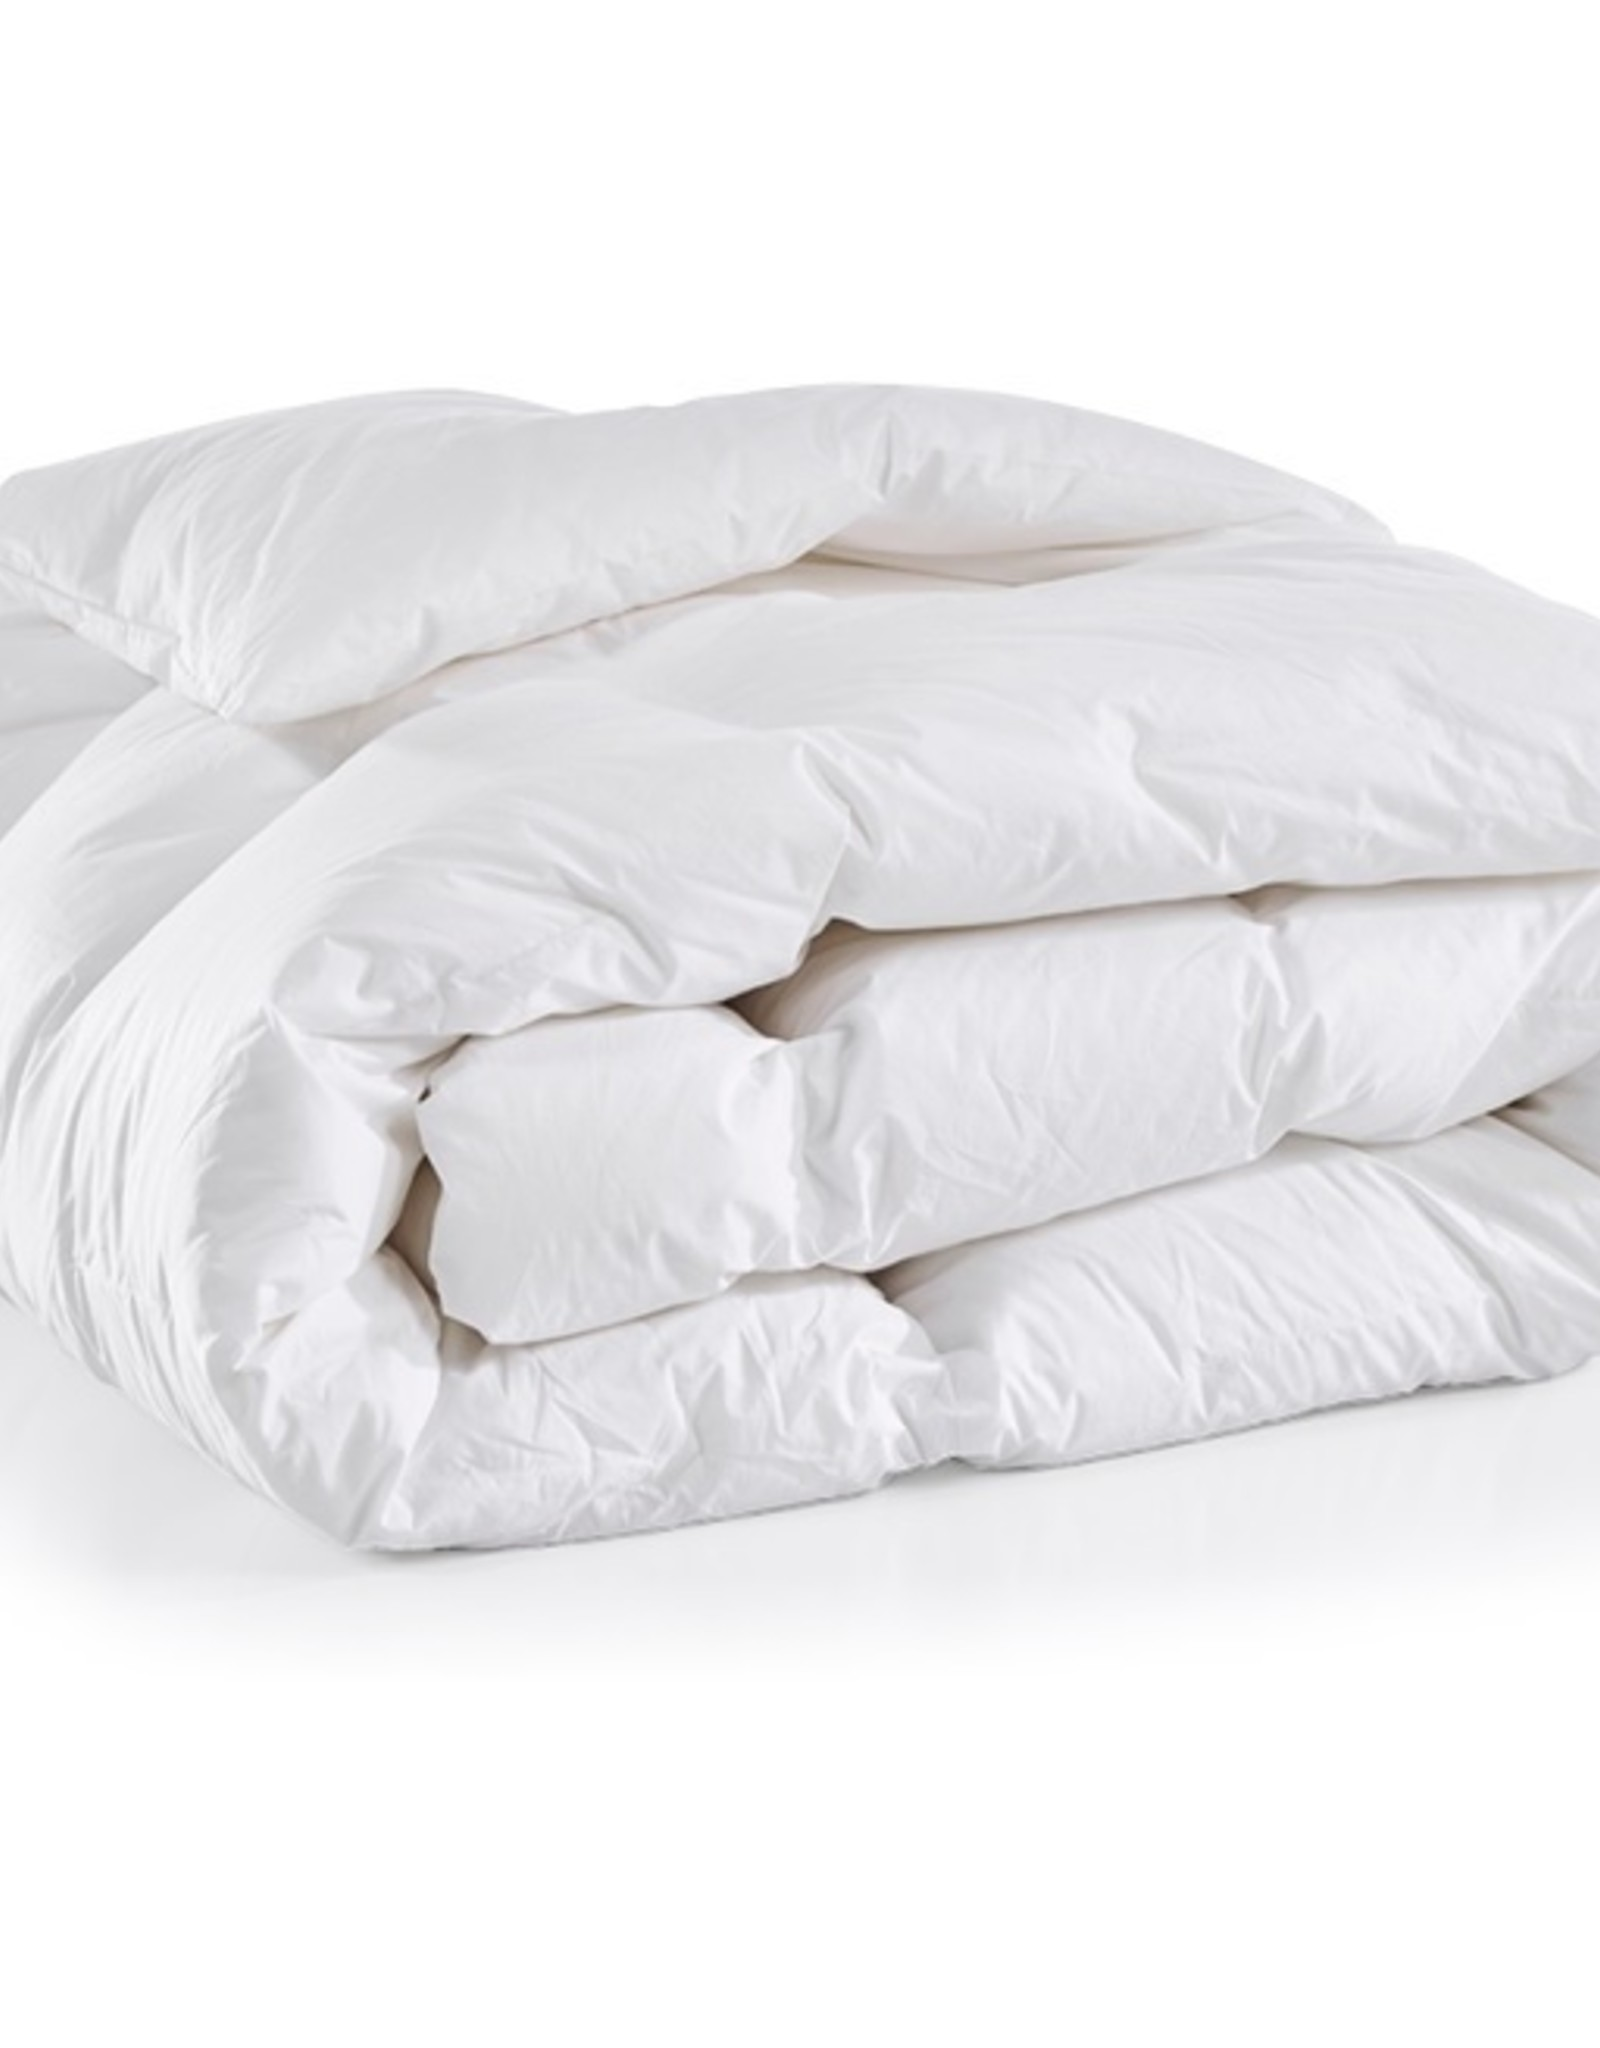 Sleepconsult Donsdeken Poolse 95% Vierseizoens